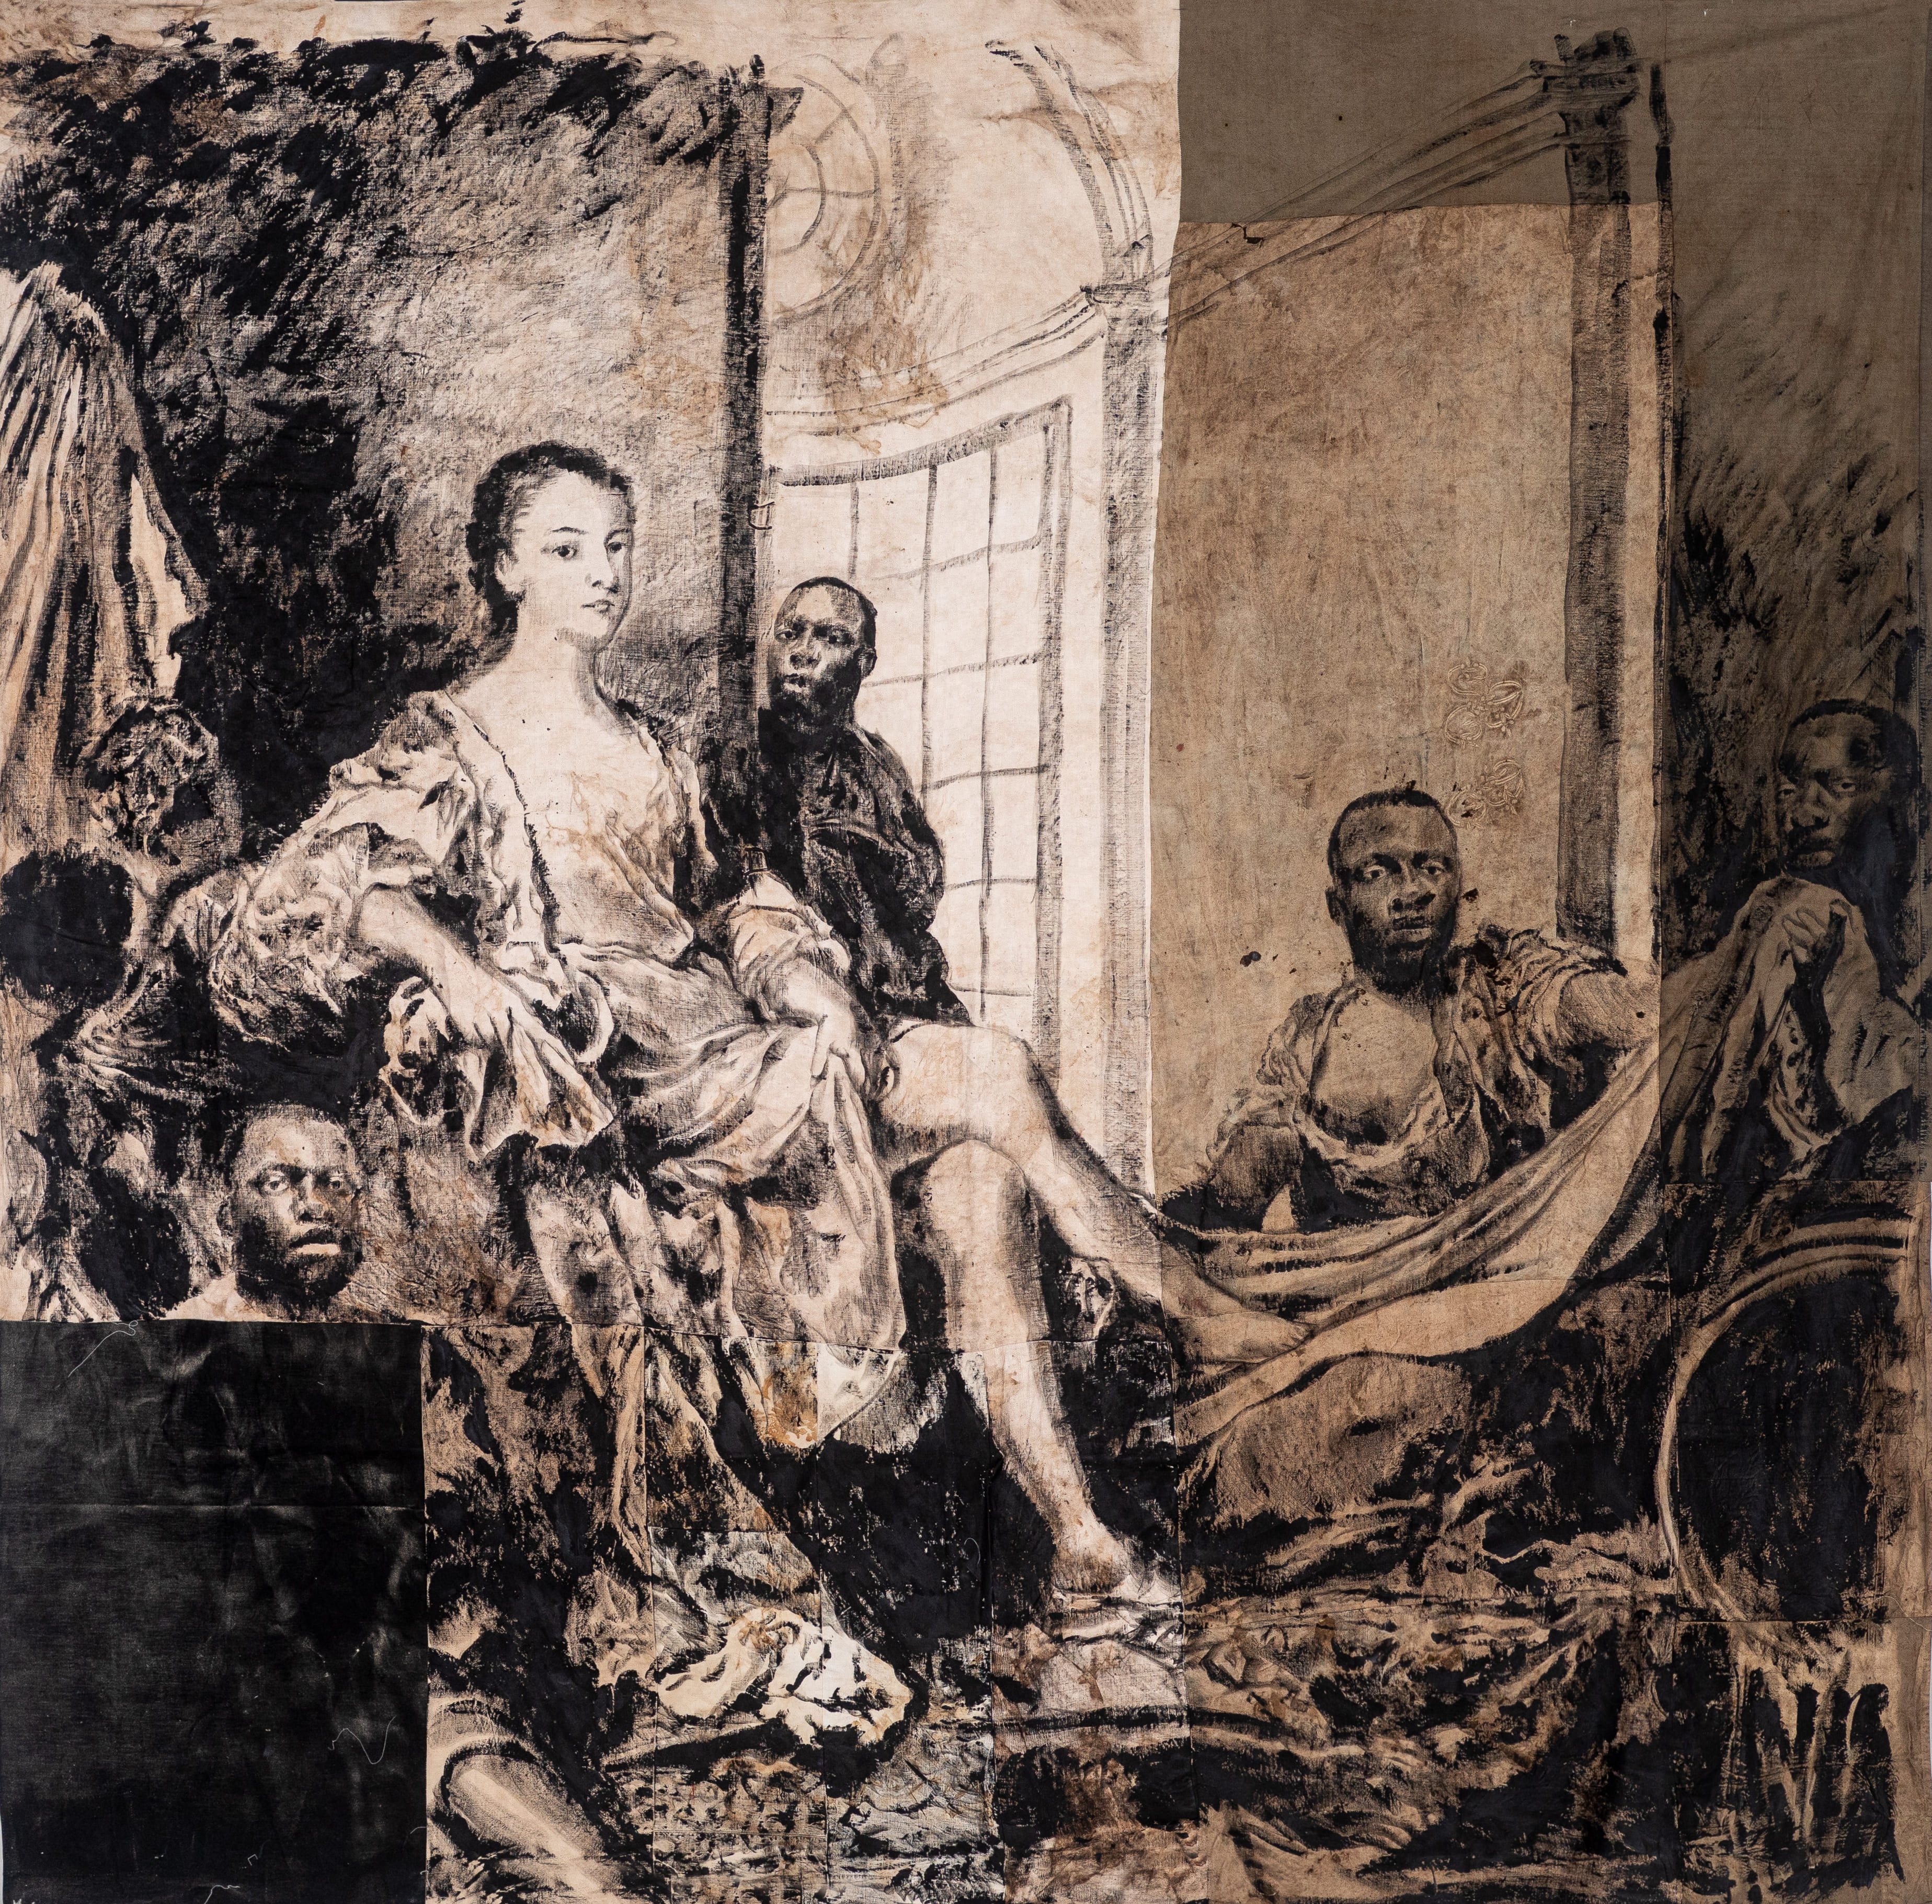 Galerie_Fakhoury - 13-09-2020 - HD - JPG (sRVB) (15 of 31)